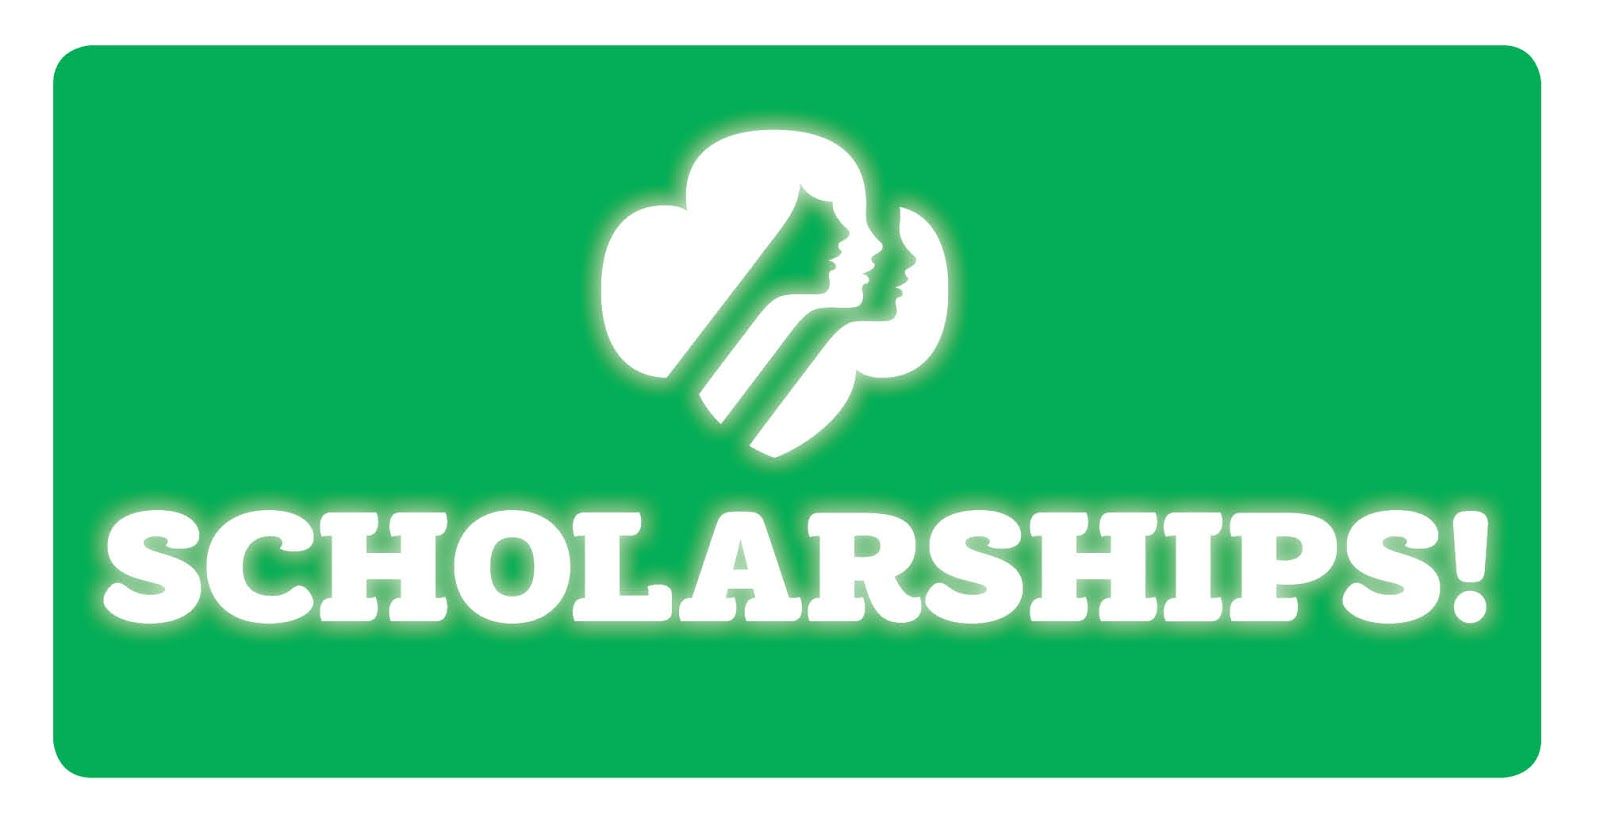 scholarships in illinois Check out illinois (illinois) hispanic scholarships in champaign, il to find apsa minority fellows program, hbcu connect minority student scholarship, george ramos.